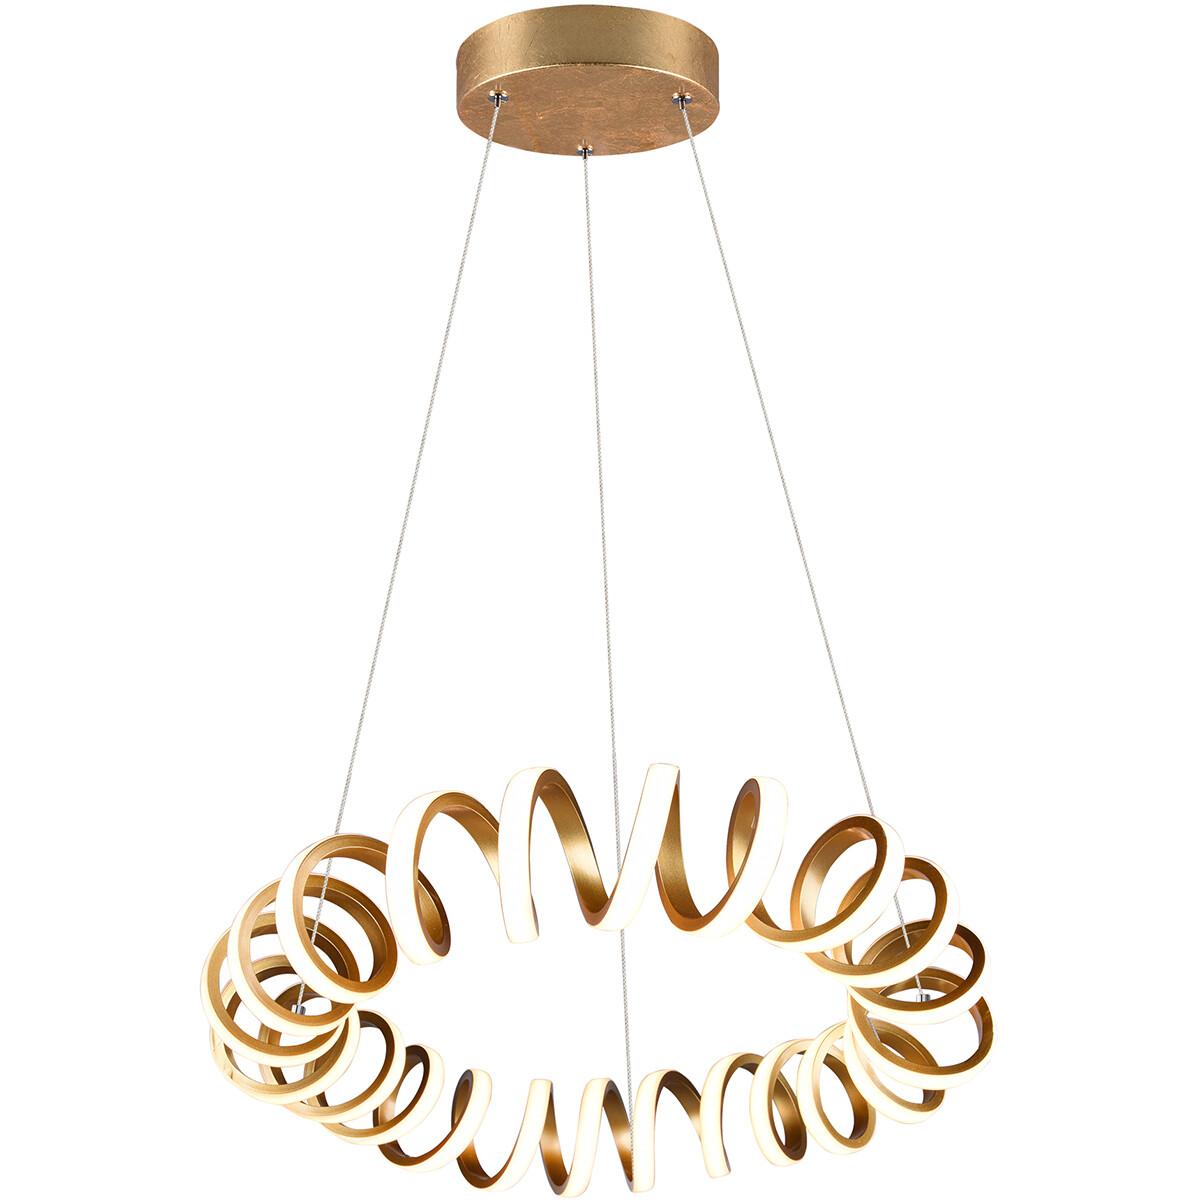 LED Hanglamp - Trion Coral - 33W - Warm Wit 3000K - Dimbaar - Rond - Mat Goud - Aluminium